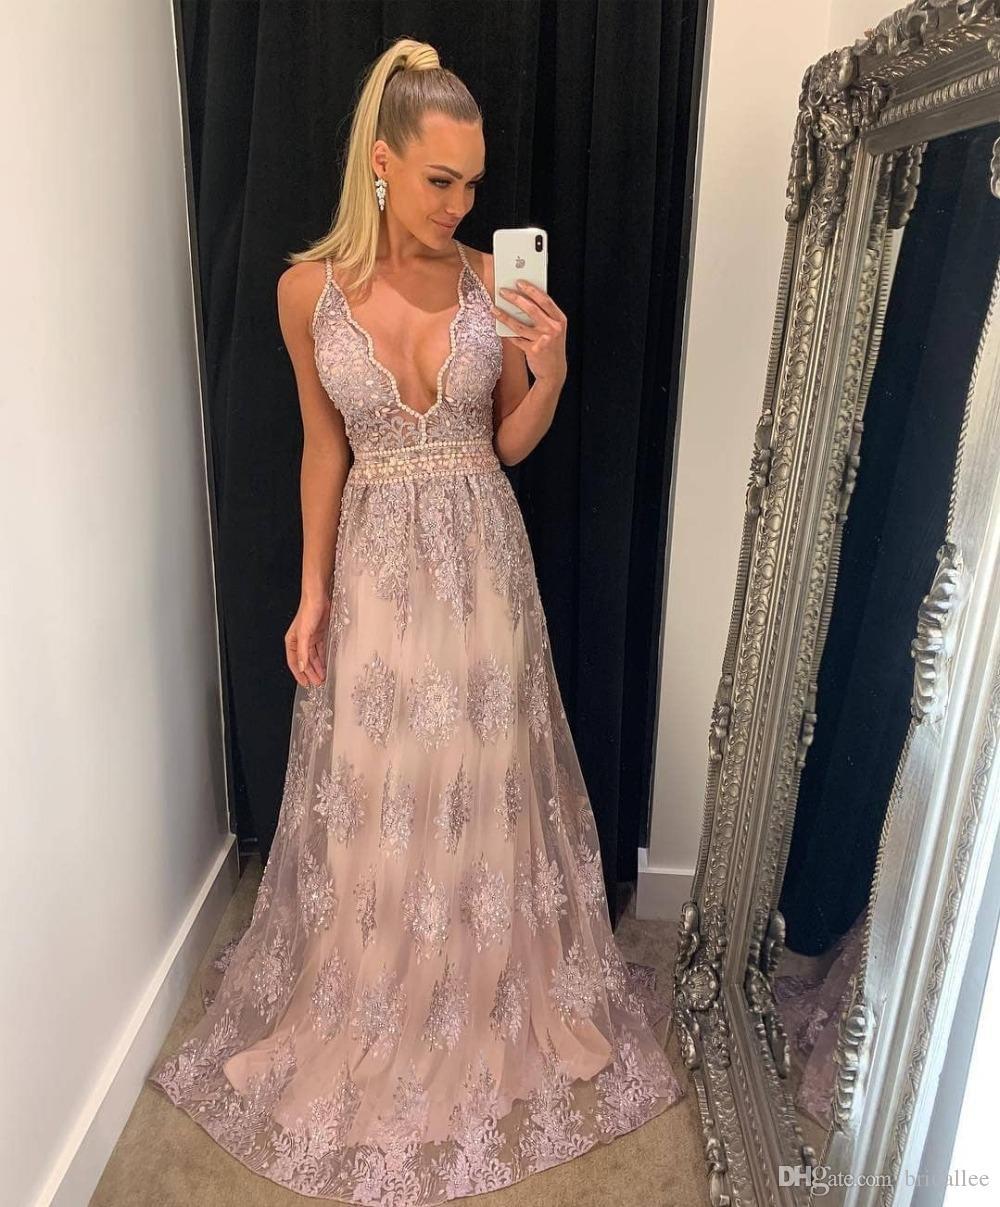 13 Genial Gala Abendkleider Spezialgebiet15 Großartig Gala Abendkleider Ärmel